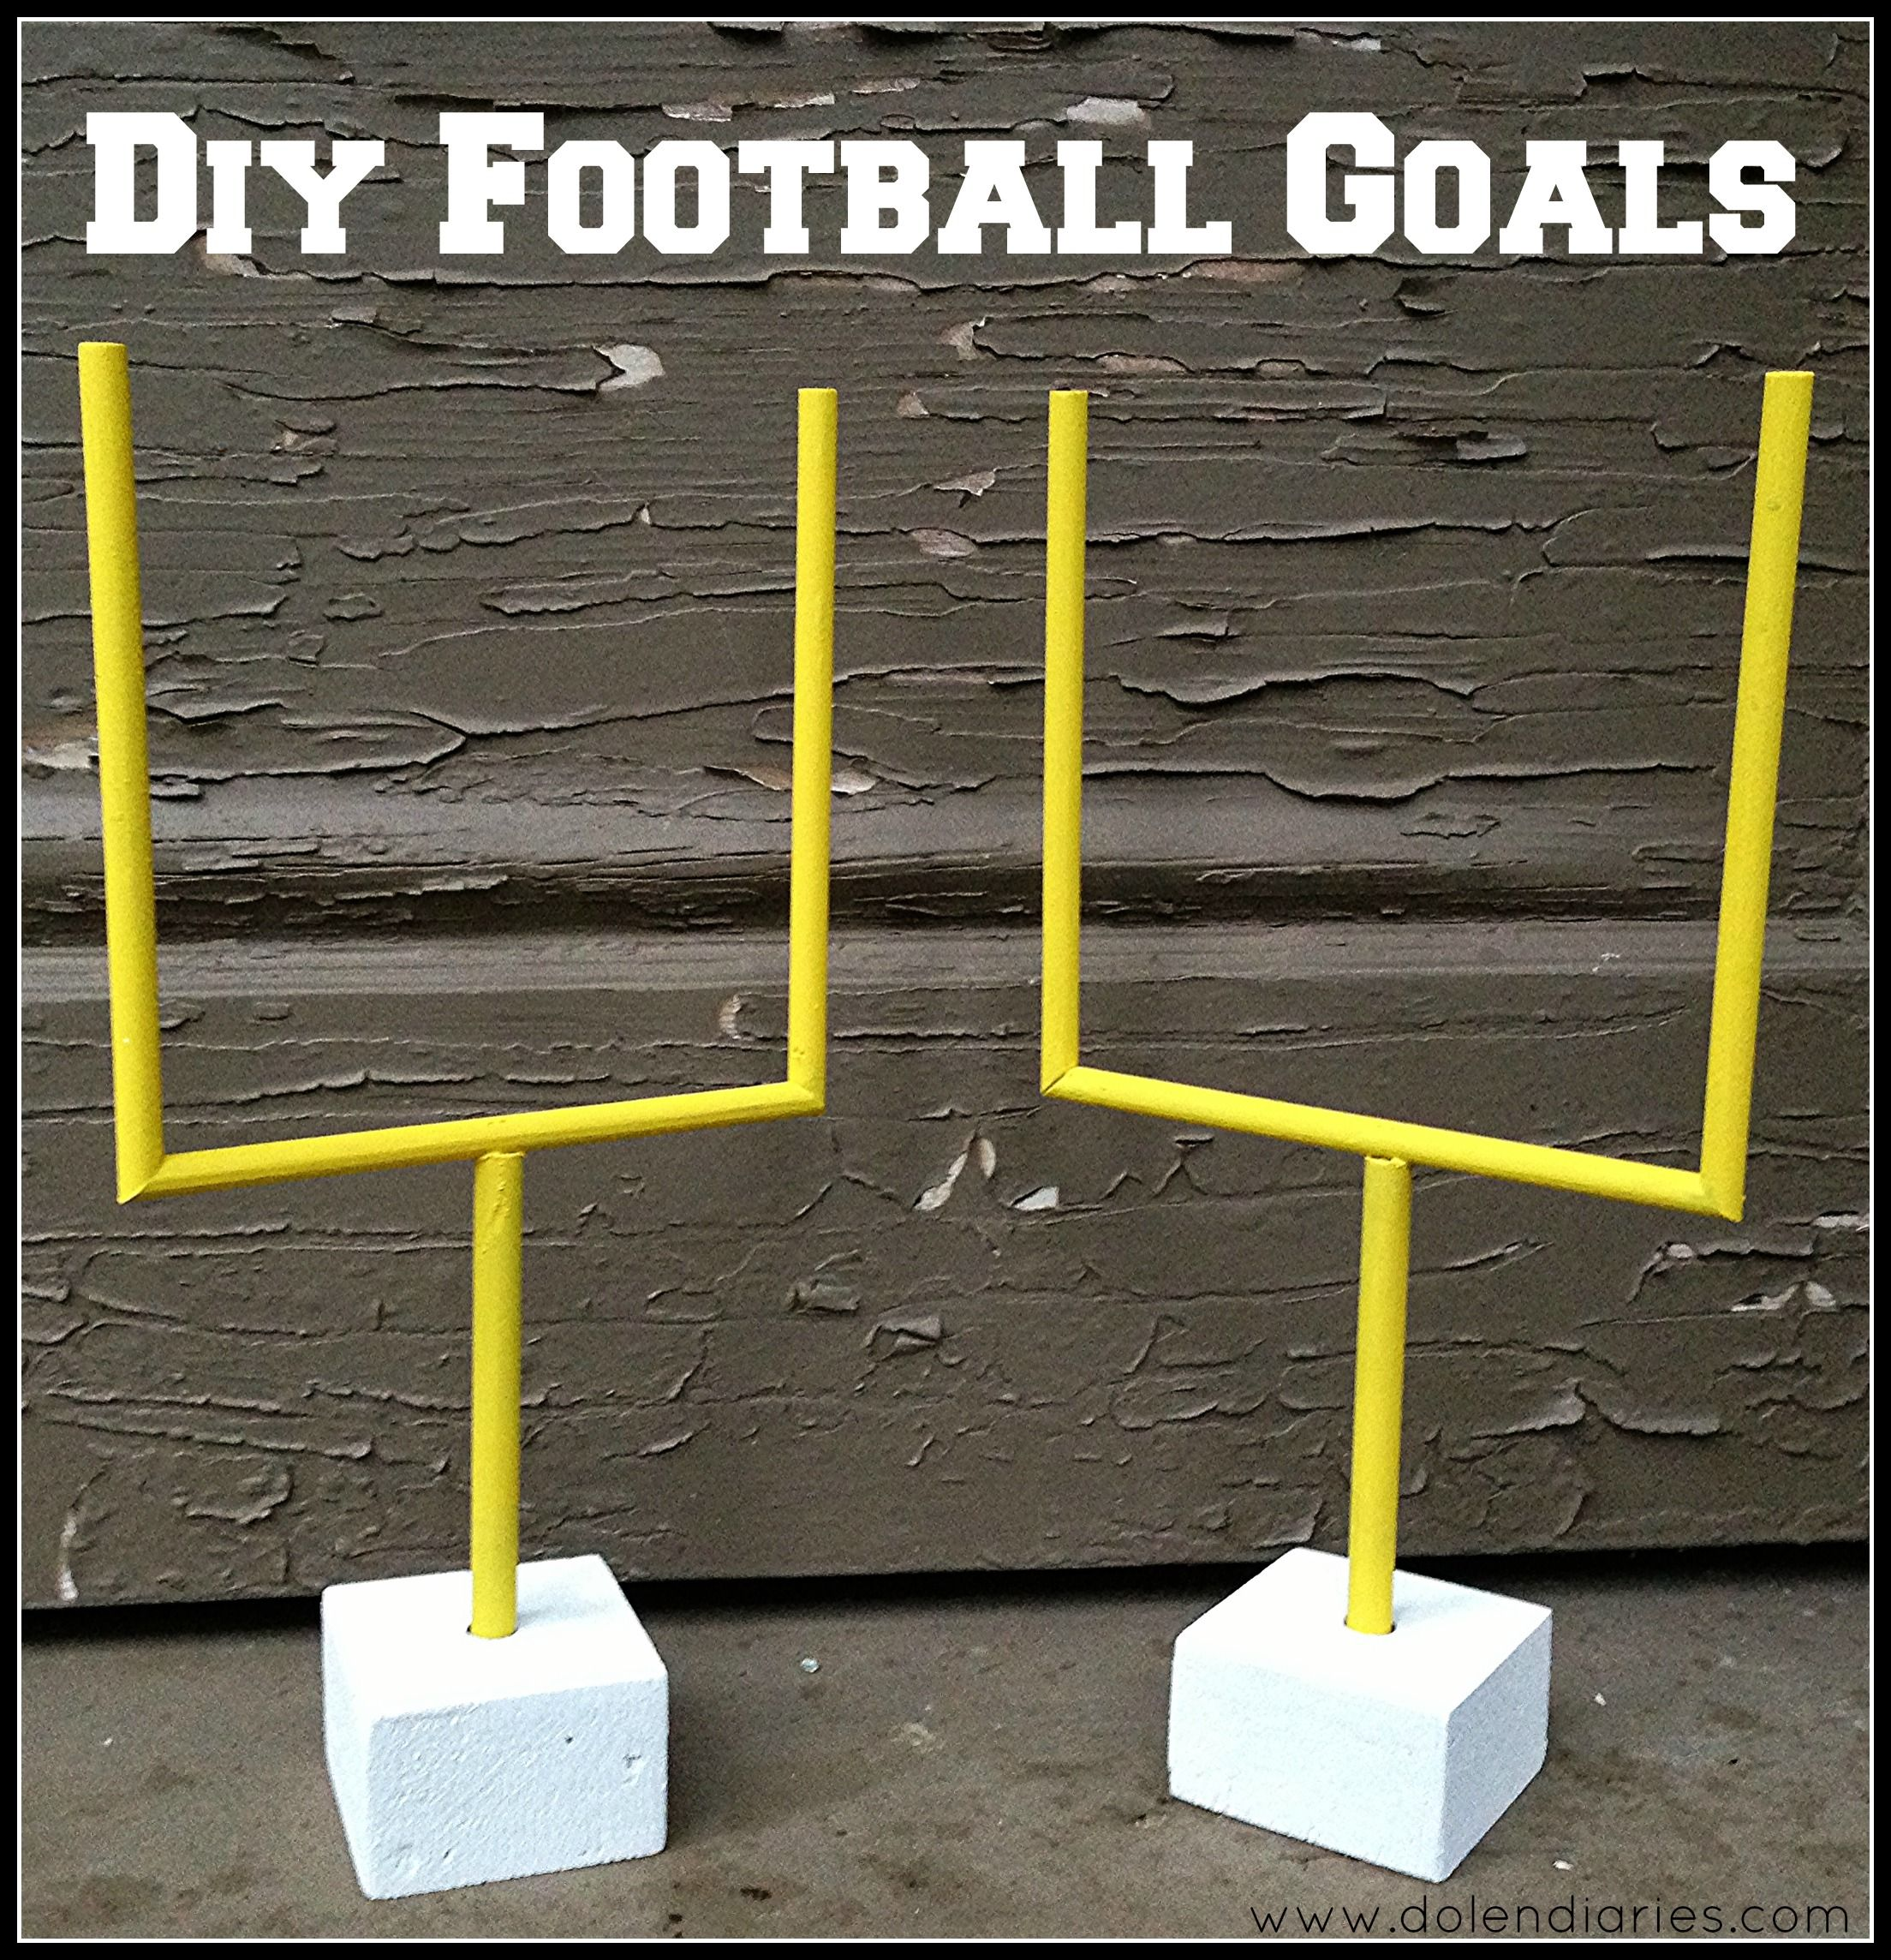 diy football goals Origami paper, Origami and Goal